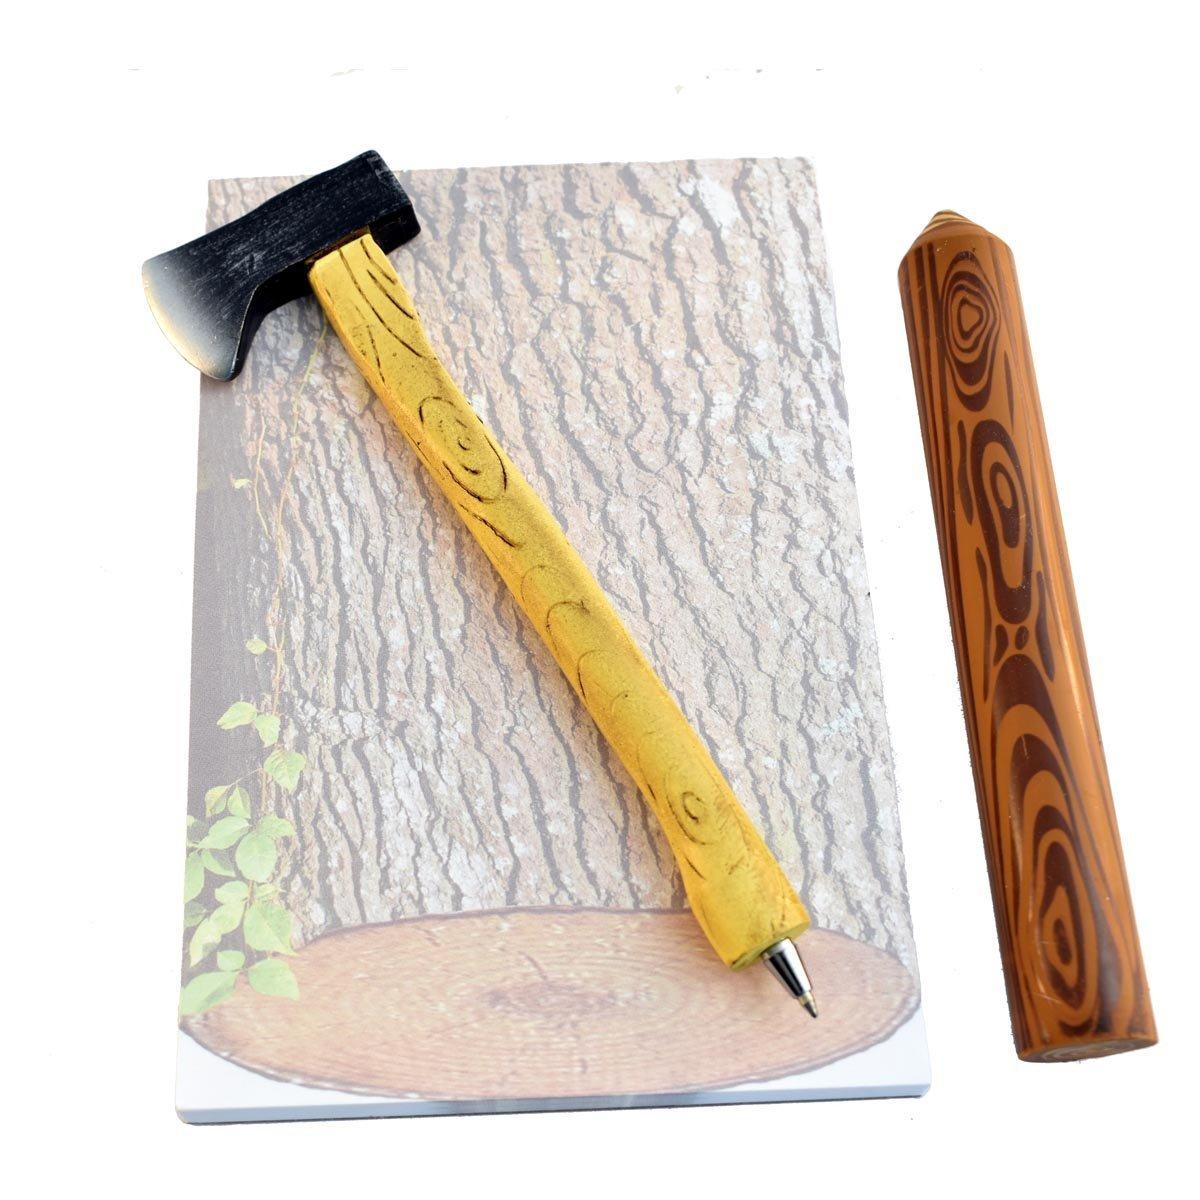 Office Gifts For Men: Axe Pen, Wood Grain Notepad And Log Eraser (Bundle